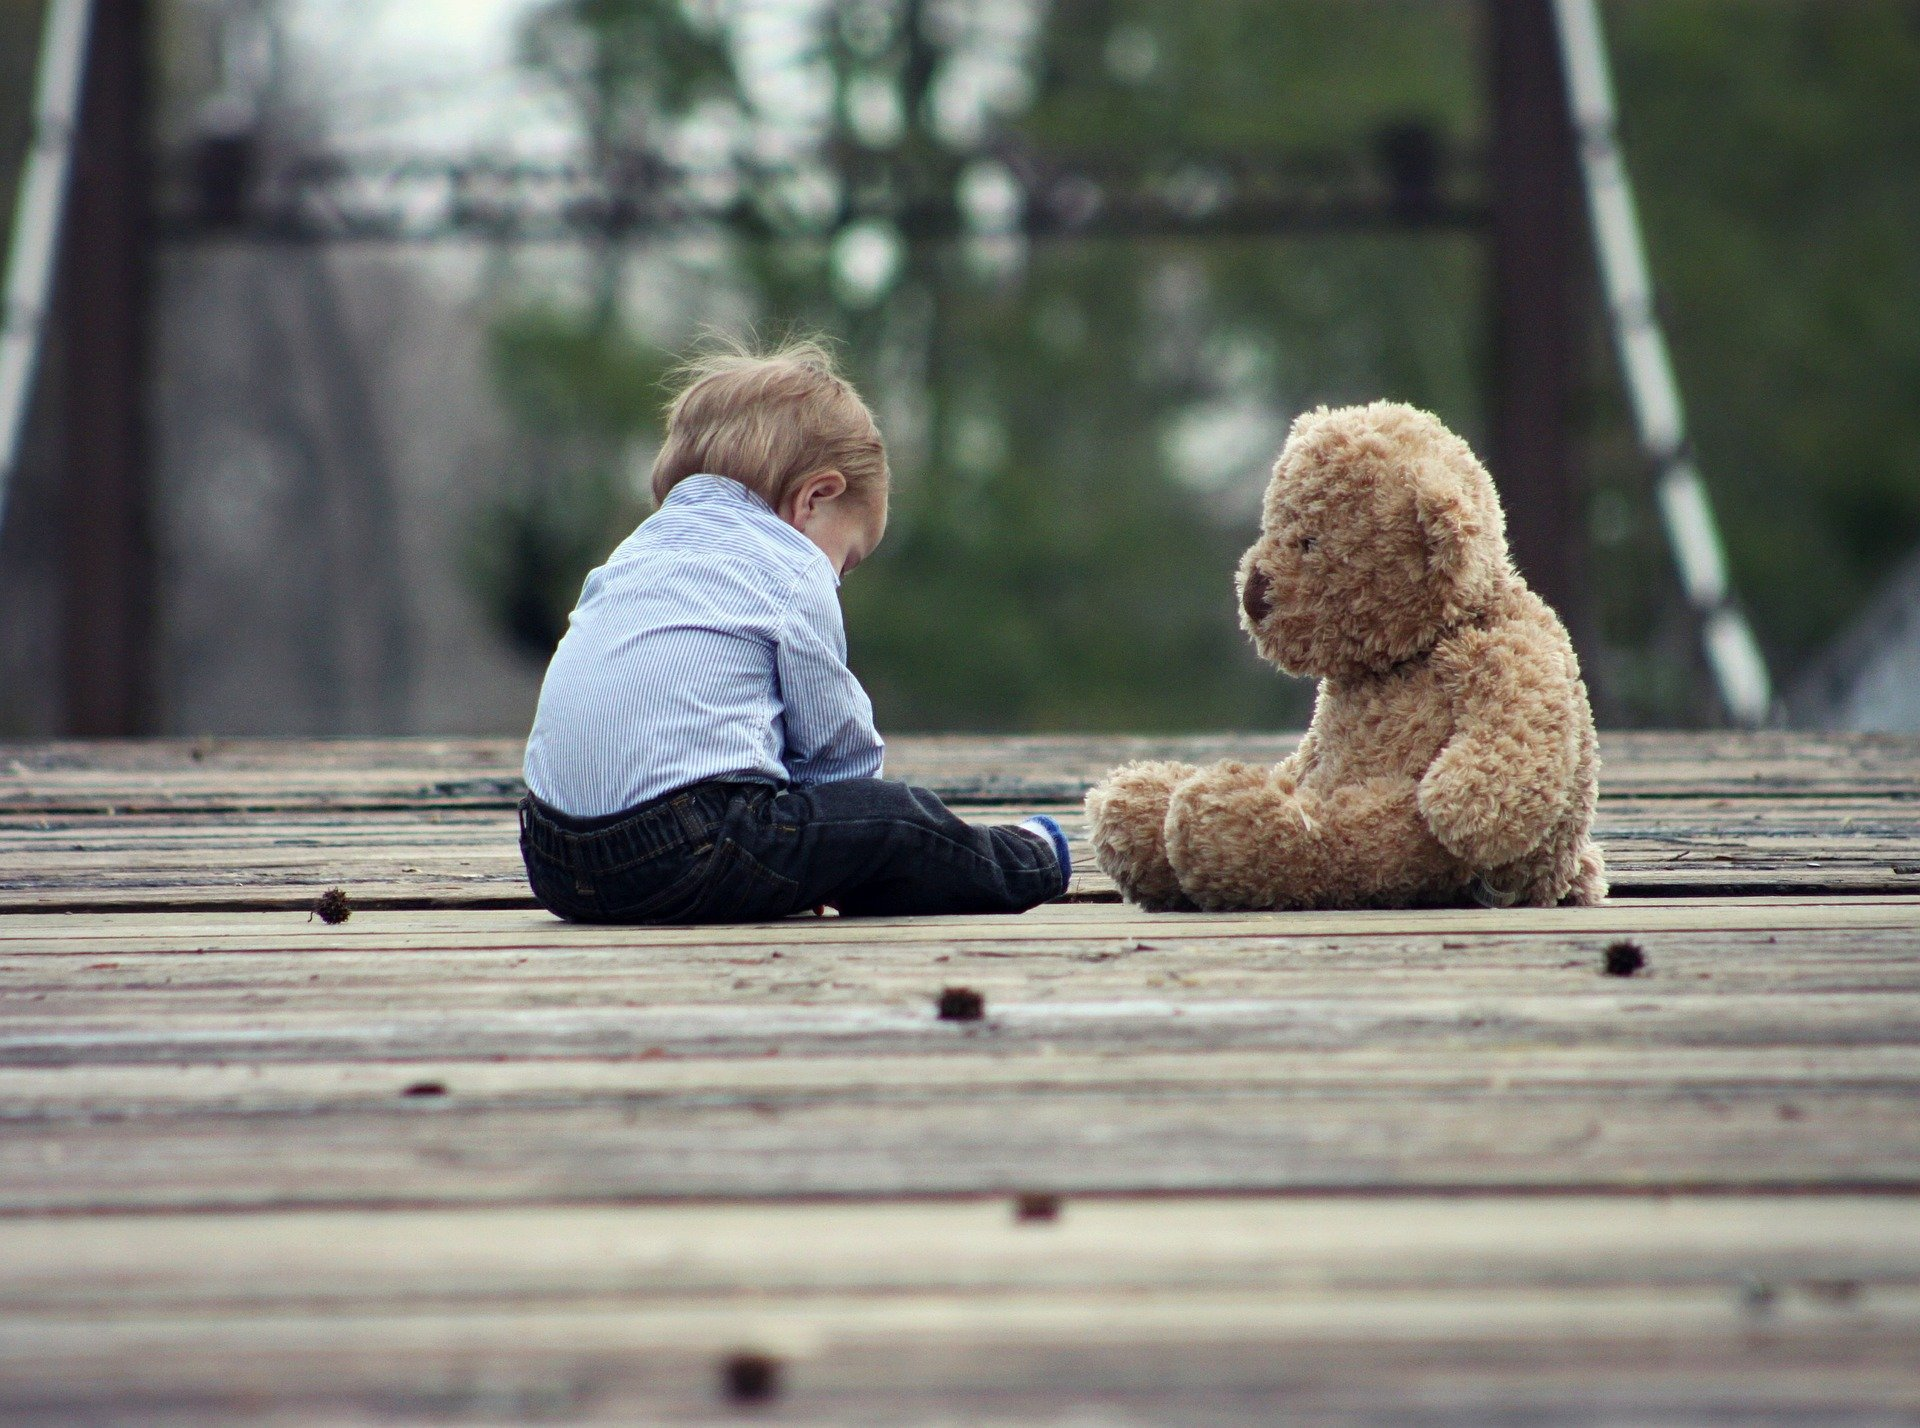 Quyền nuôi con sau khi ly hôn?